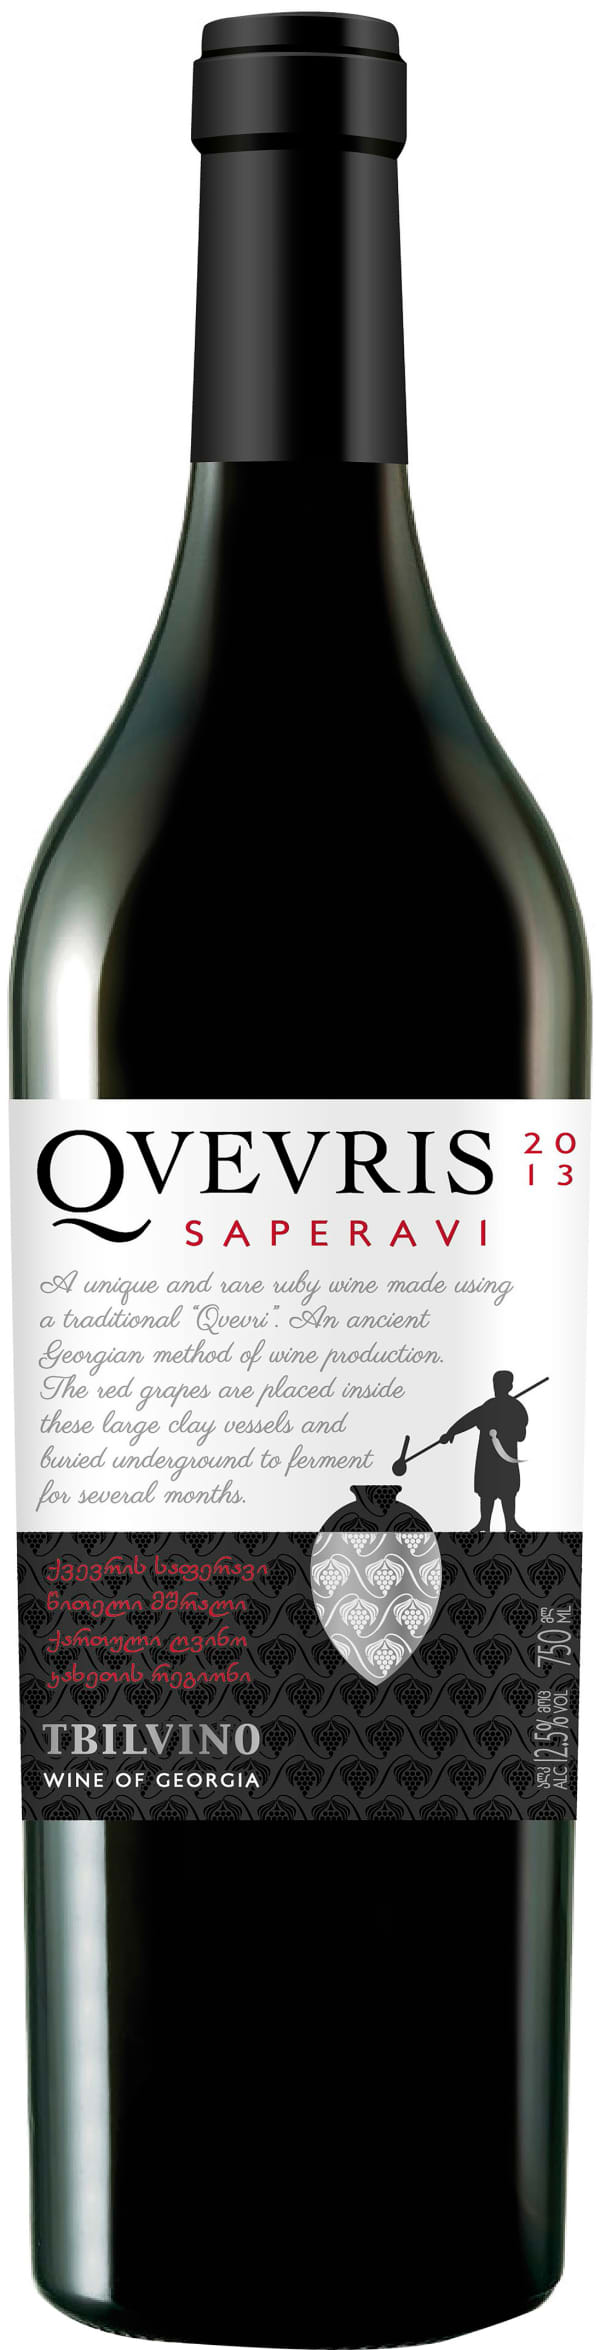 Qvevris Saperavi 2017